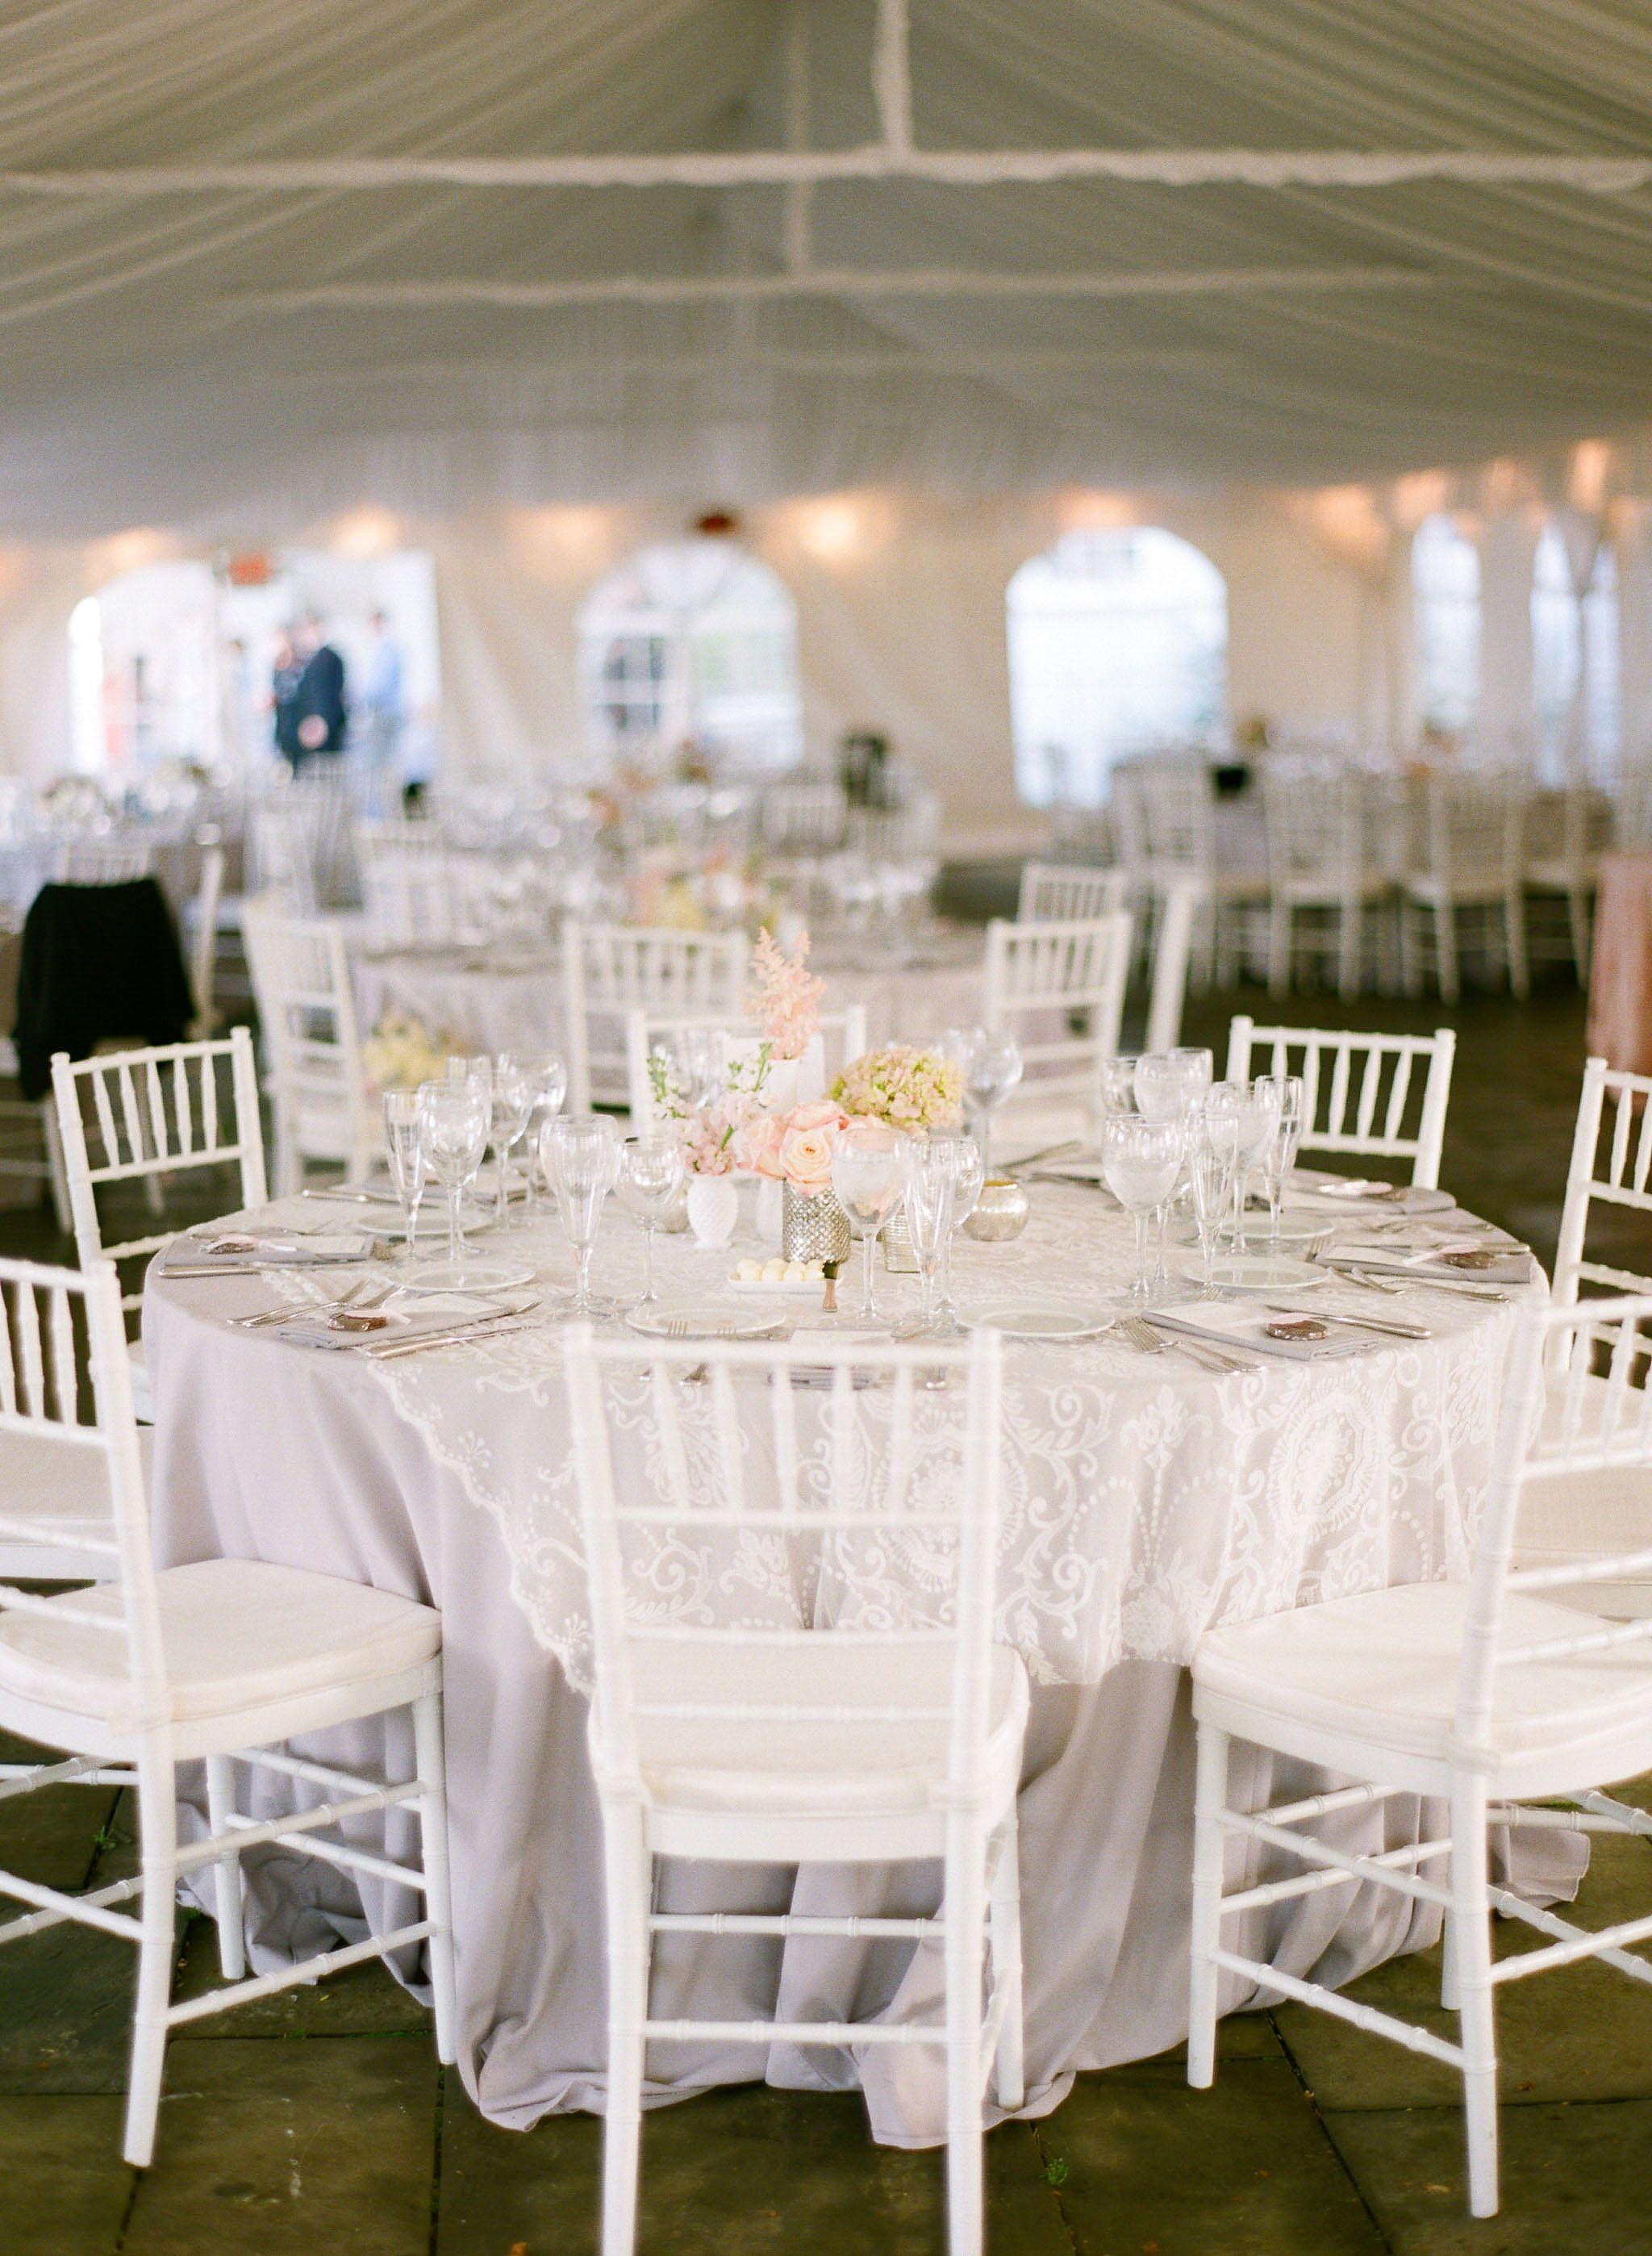 Tent Wedding White Chivari Chairs Grey Twill Table Cloth Lace Overlay Etsy Milk Gl Mercury Centerpieces